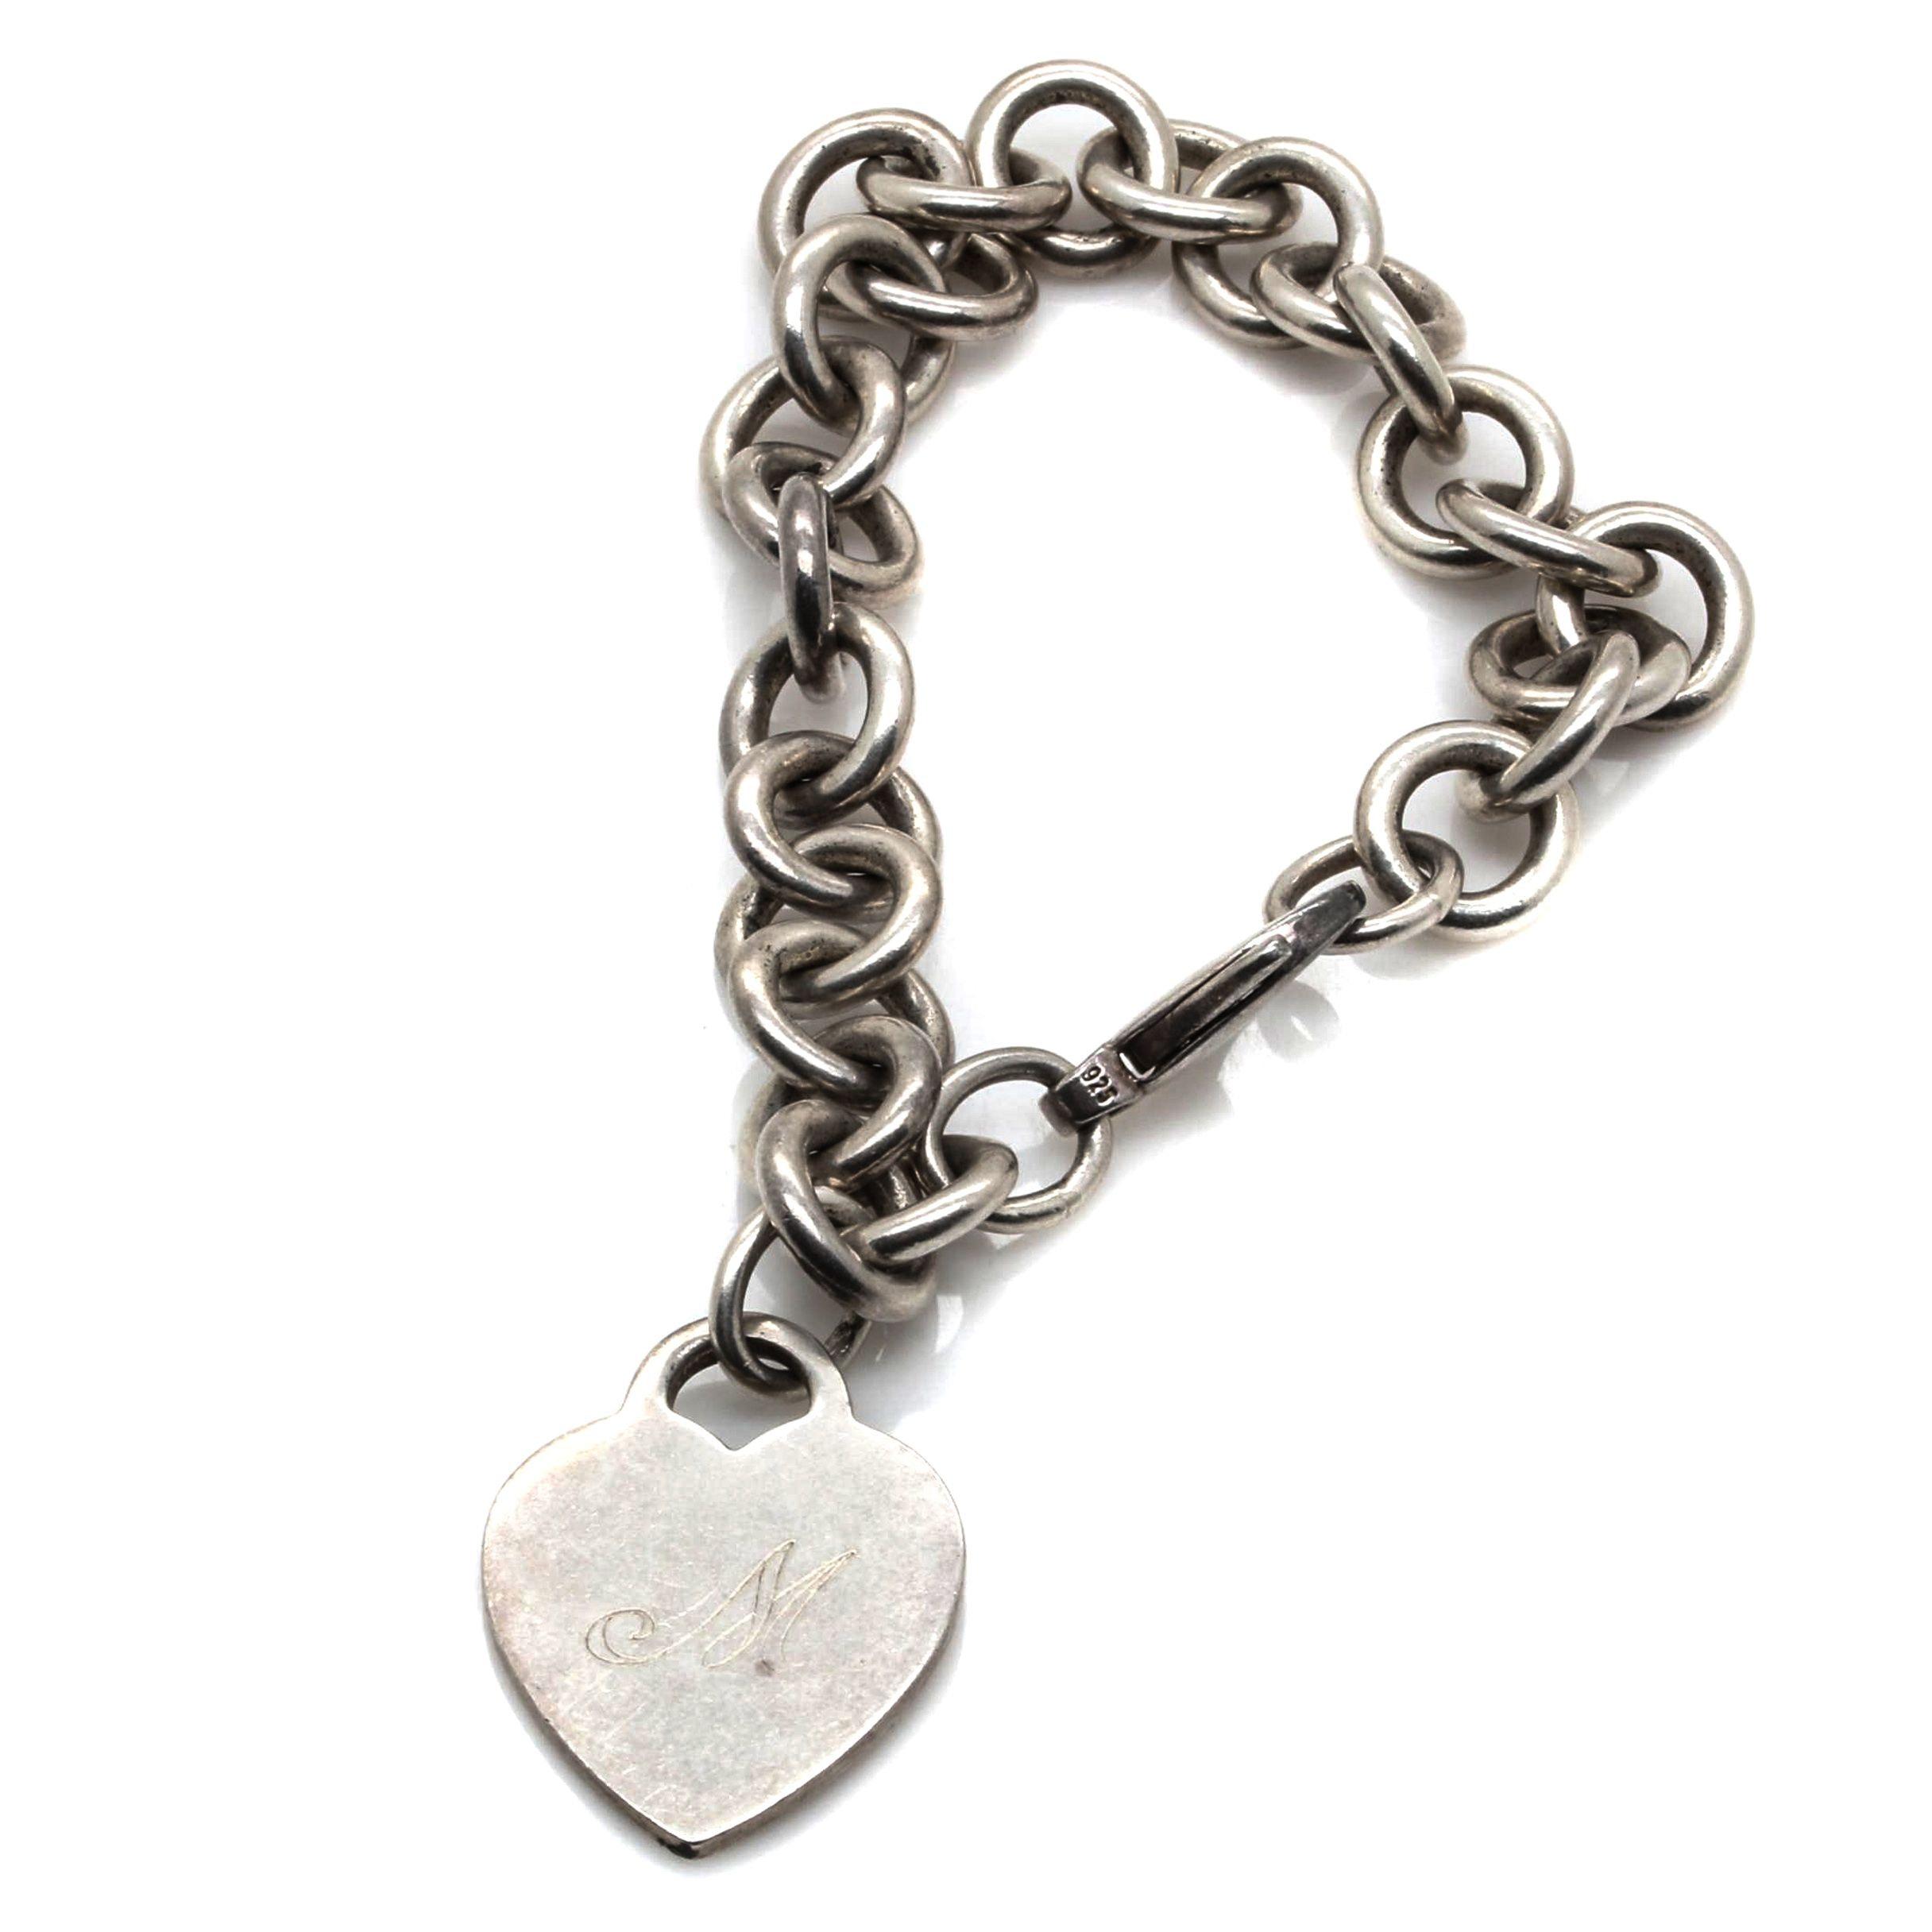 Tiffany & Co. Sterling Silver Engraved Heart Bracelet